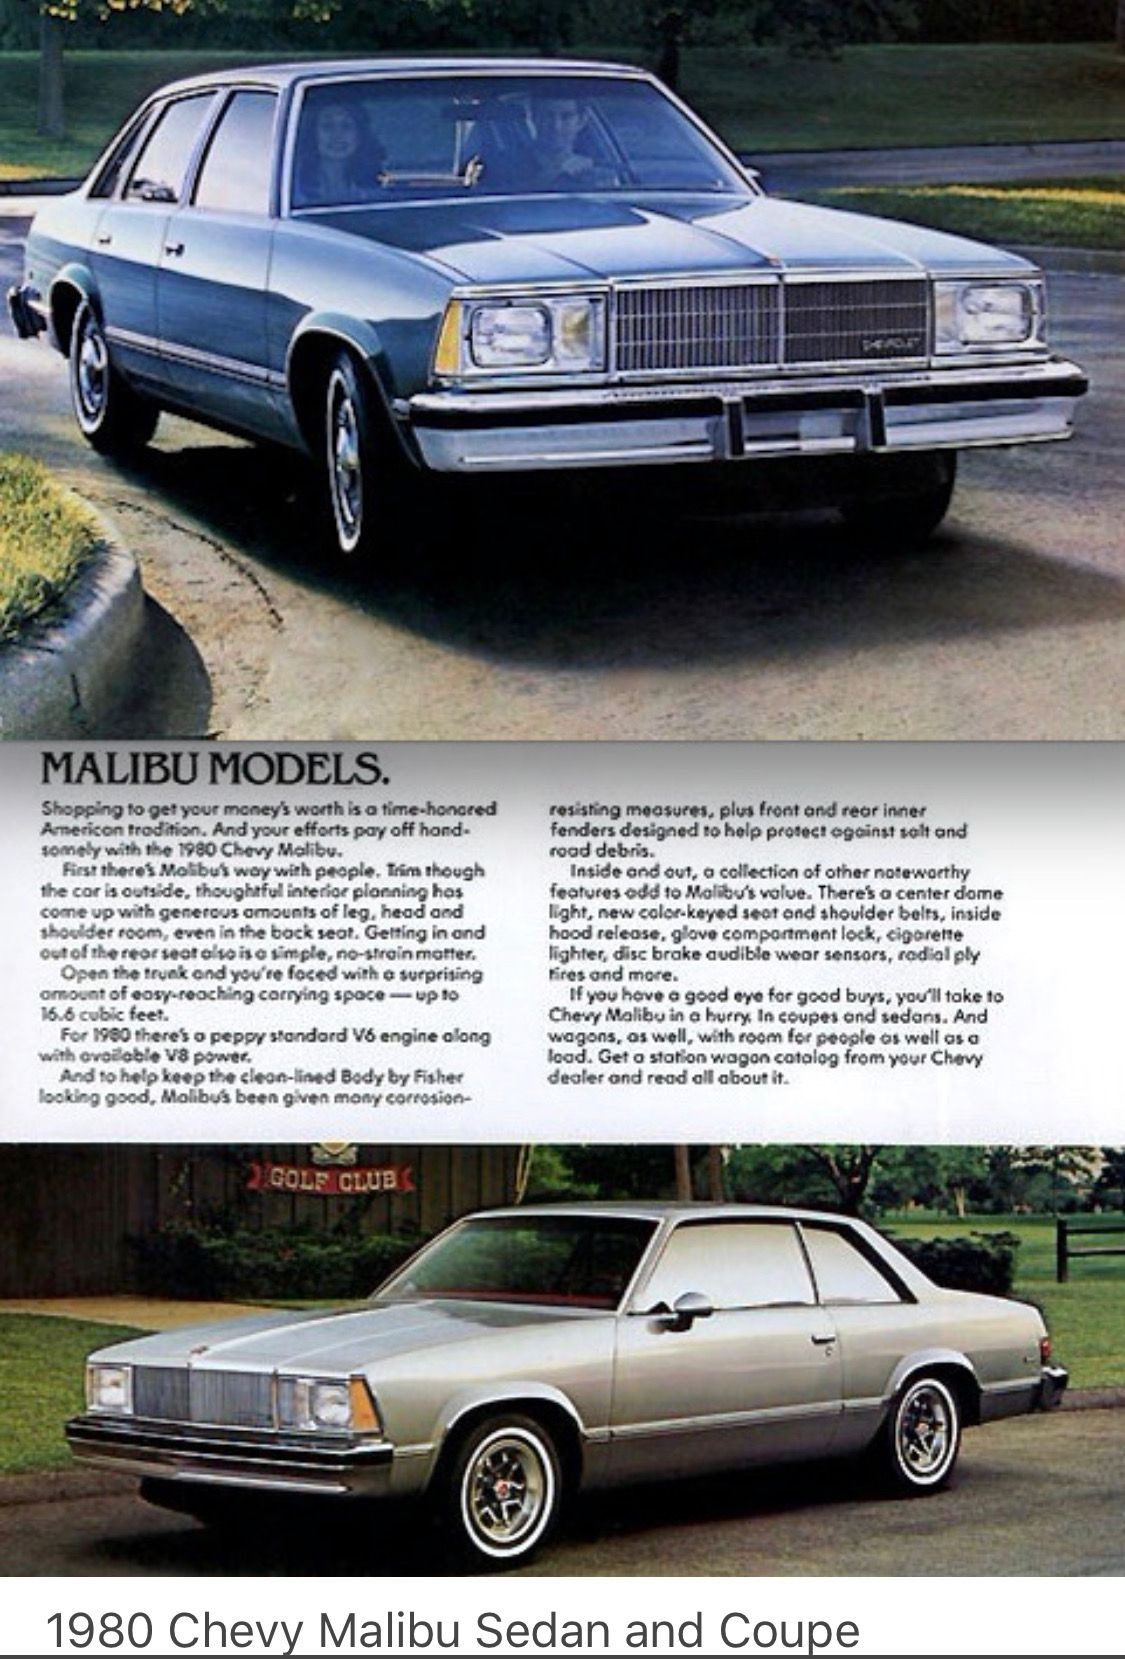 1980 Chevy Malibu Sedan Coupe Usa Chevrolet Malibu Chevy Malibu American Classic Cars